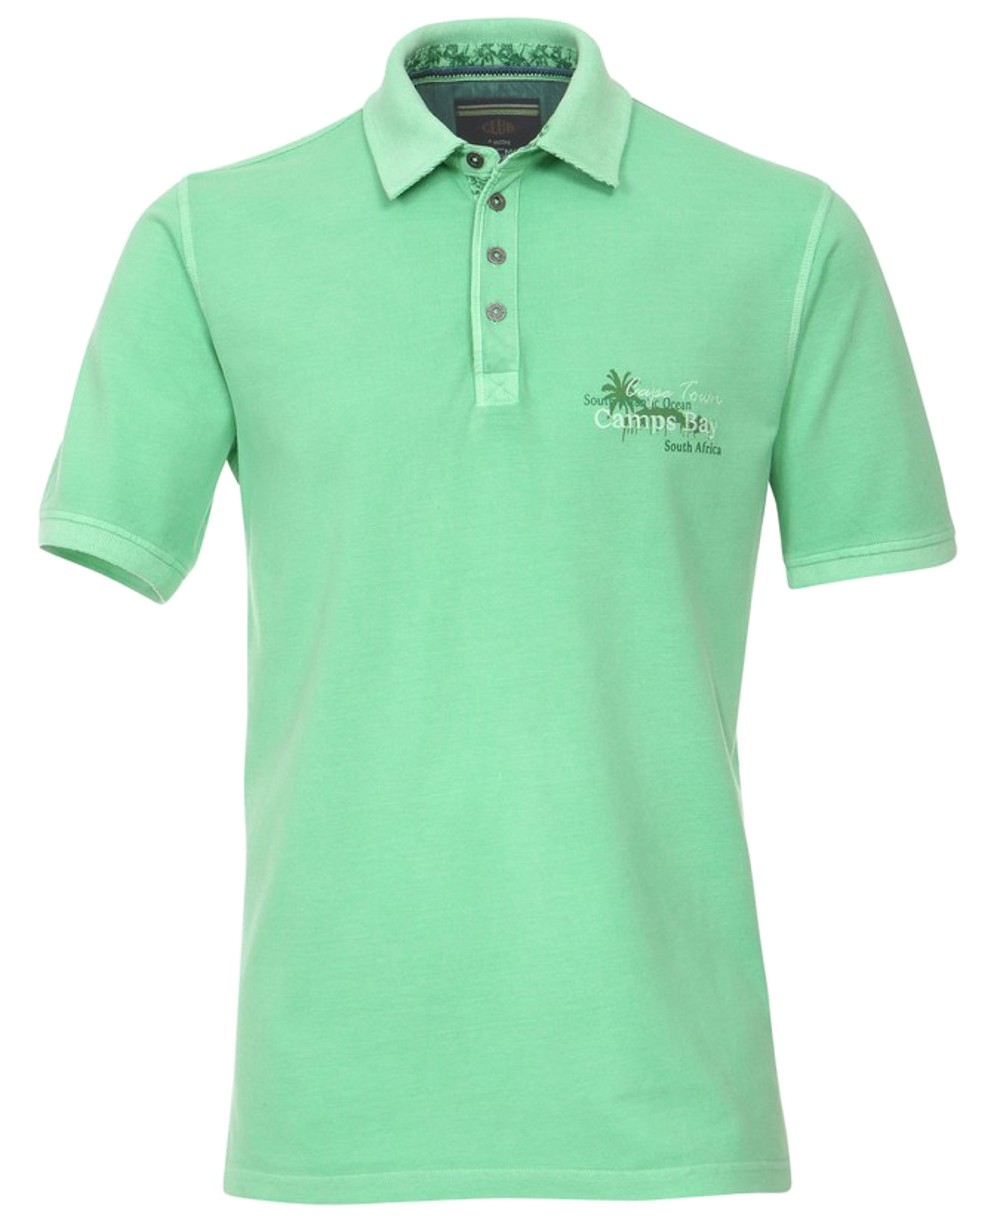 casa moda polo shirt camps bay 962384900 326 hochwertige herrenmode f hrender marken zu fairen. Black Bedroom Furniture Sets. Home Design Ideas